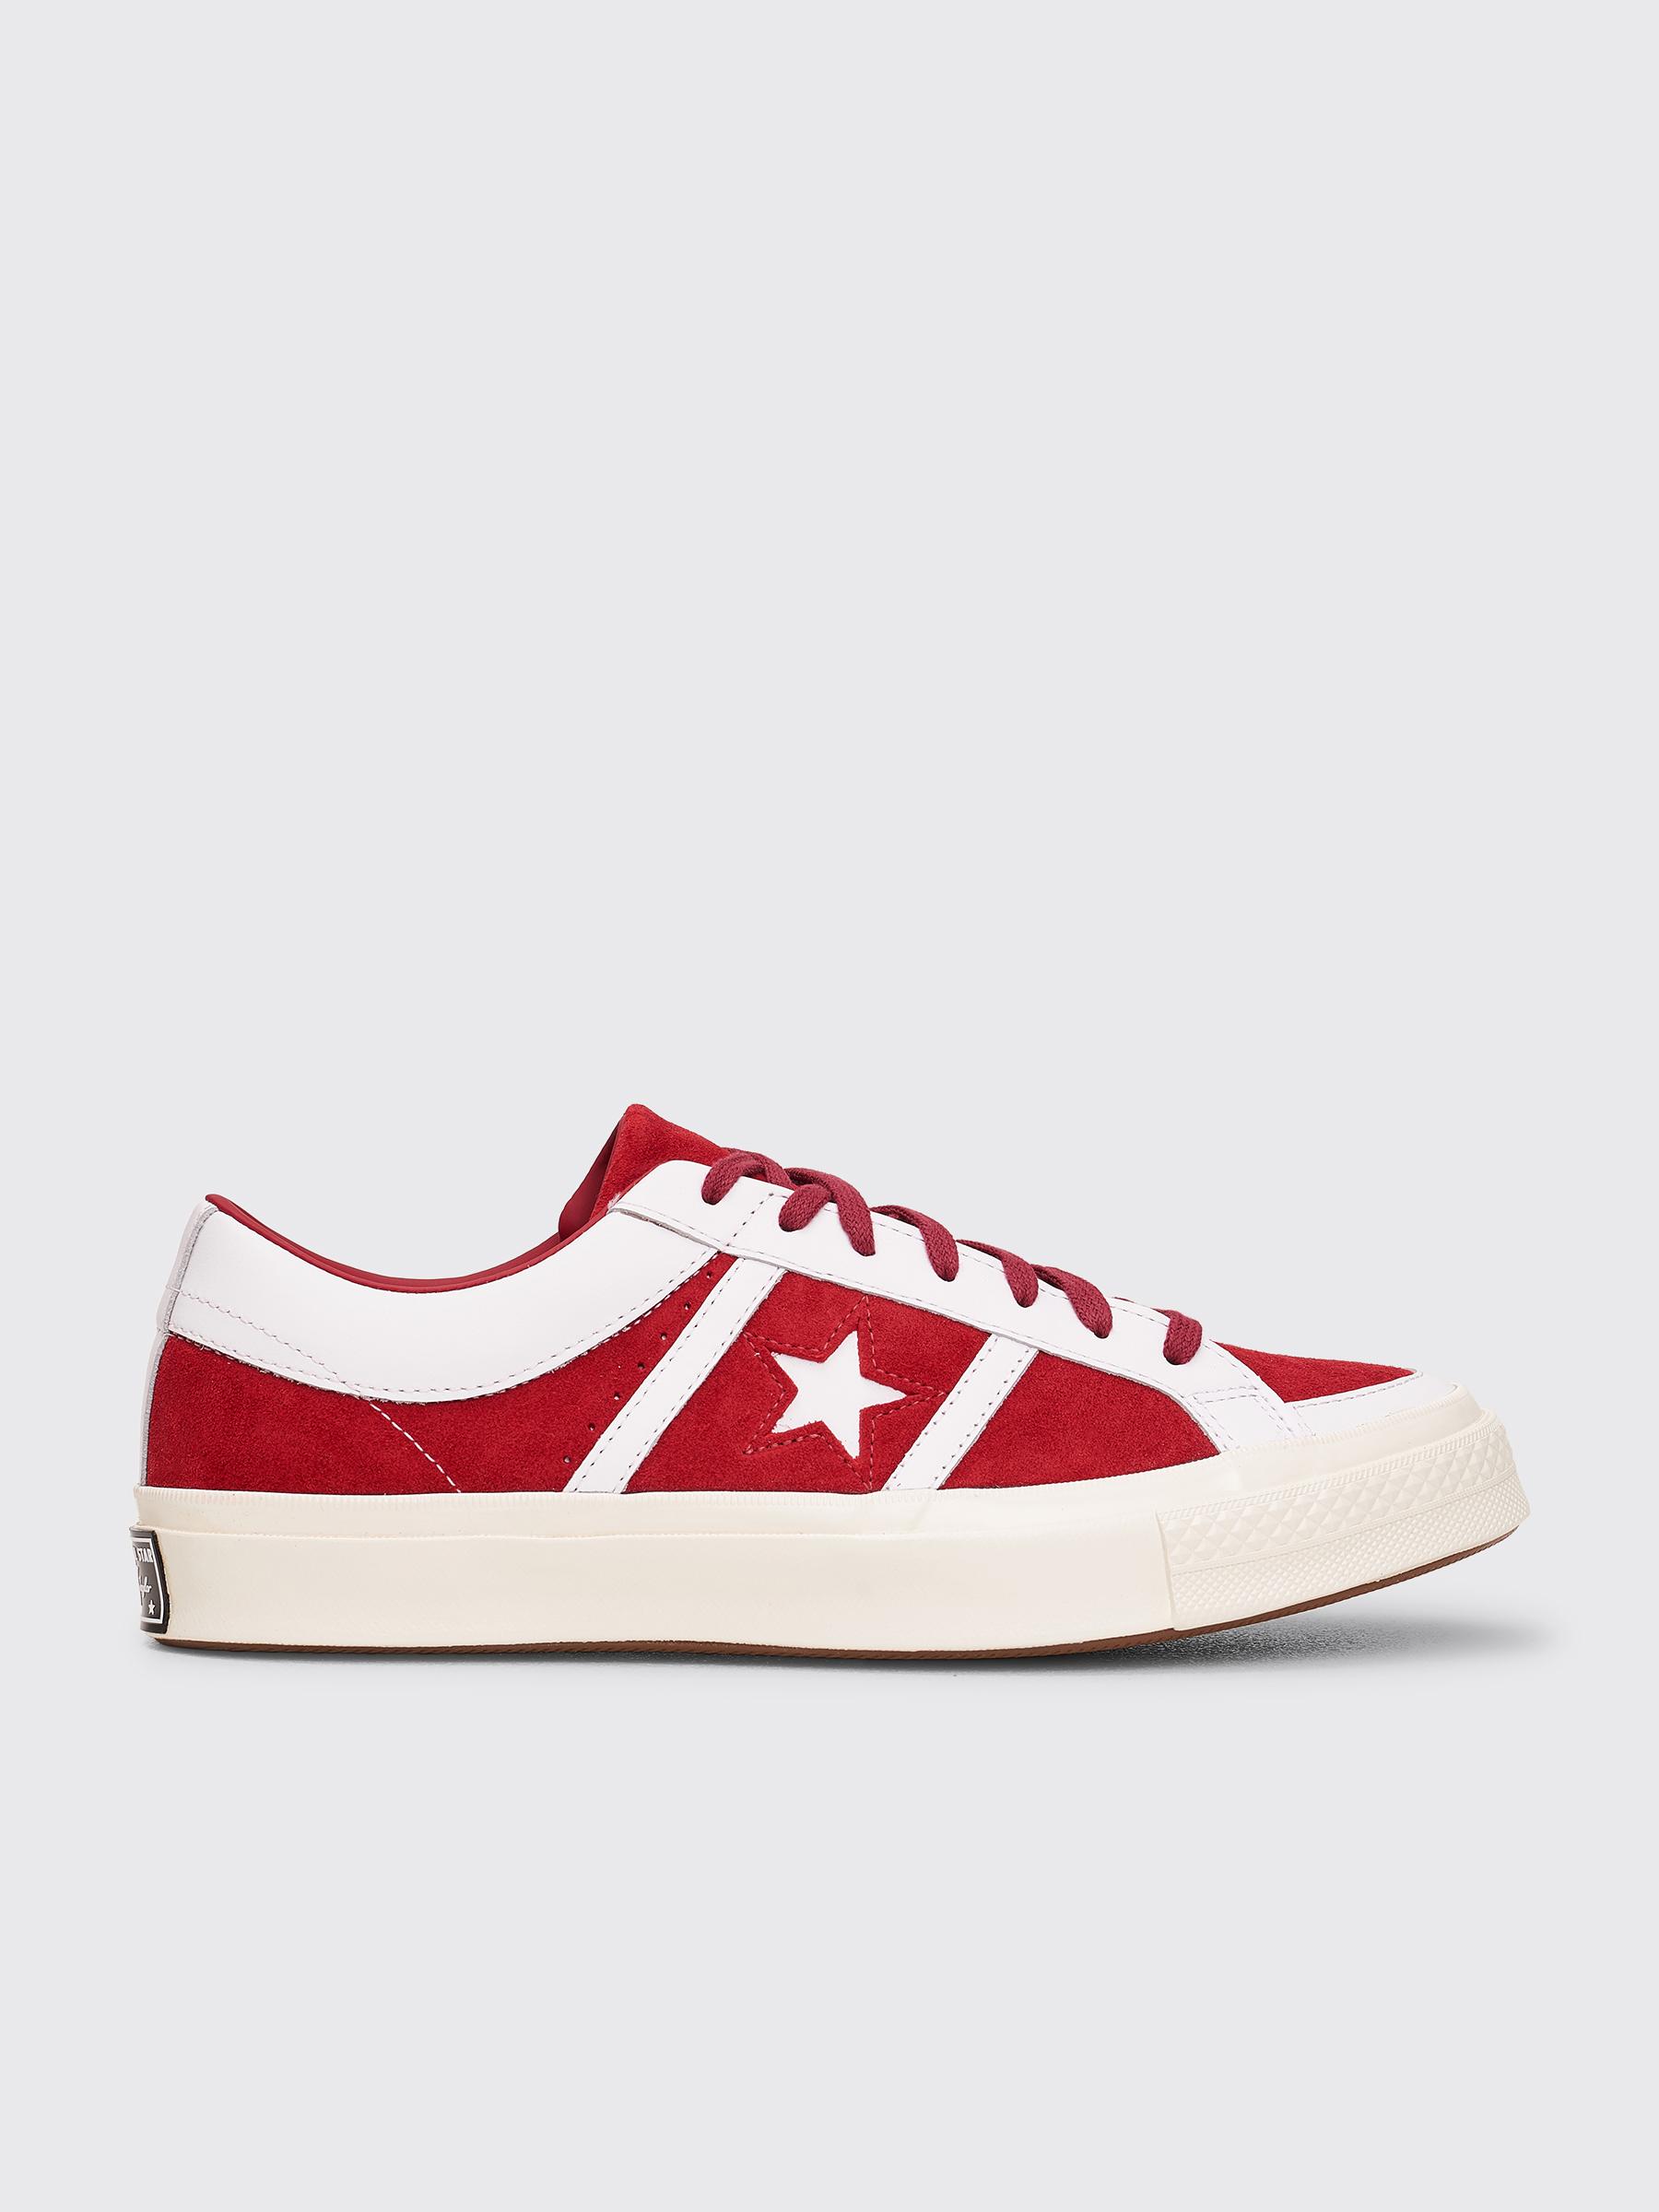 converse one star x